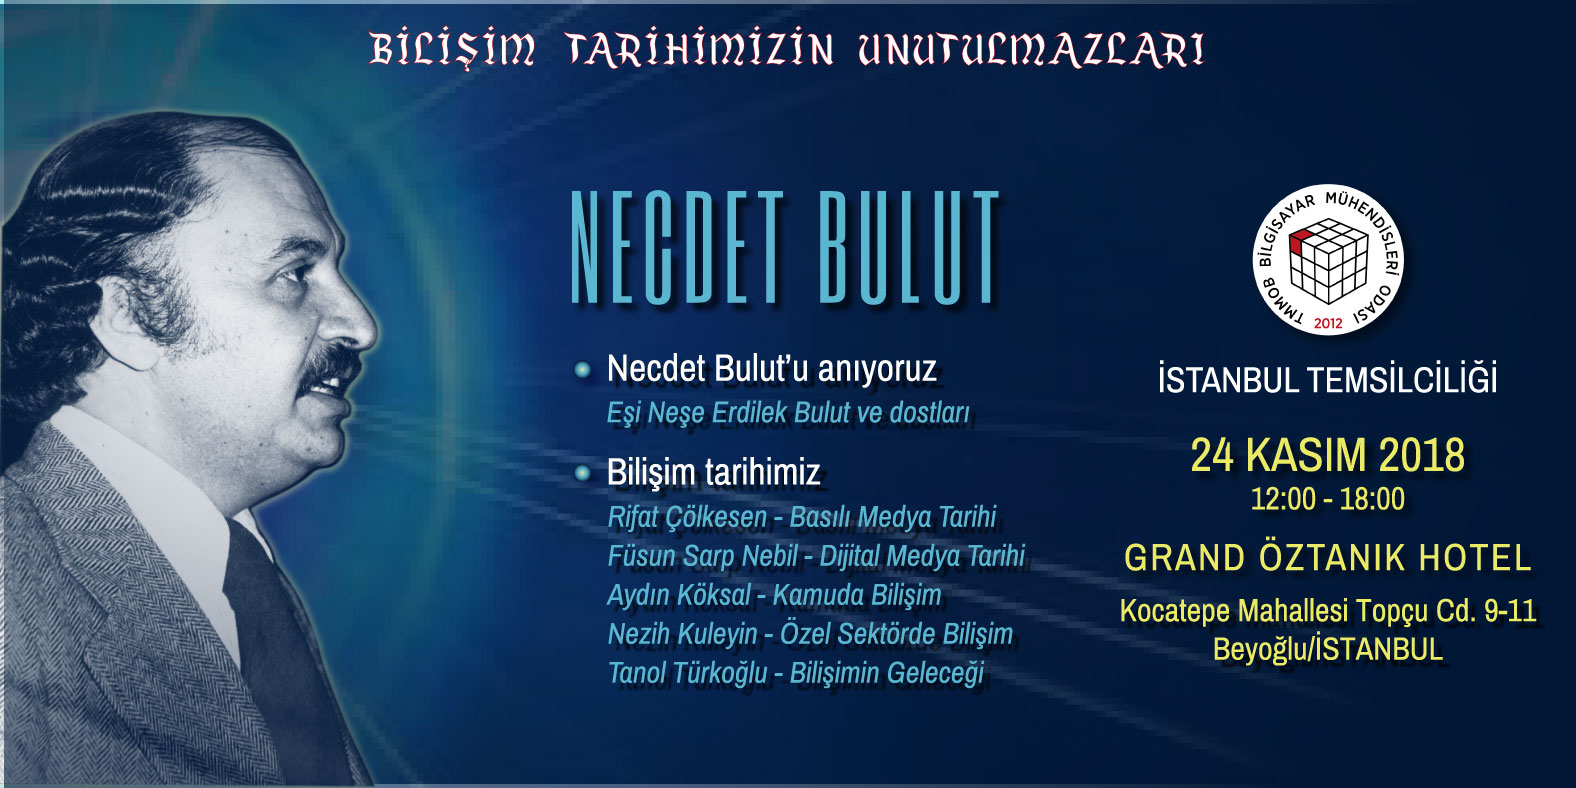 Necdet-Bulut-Event-1